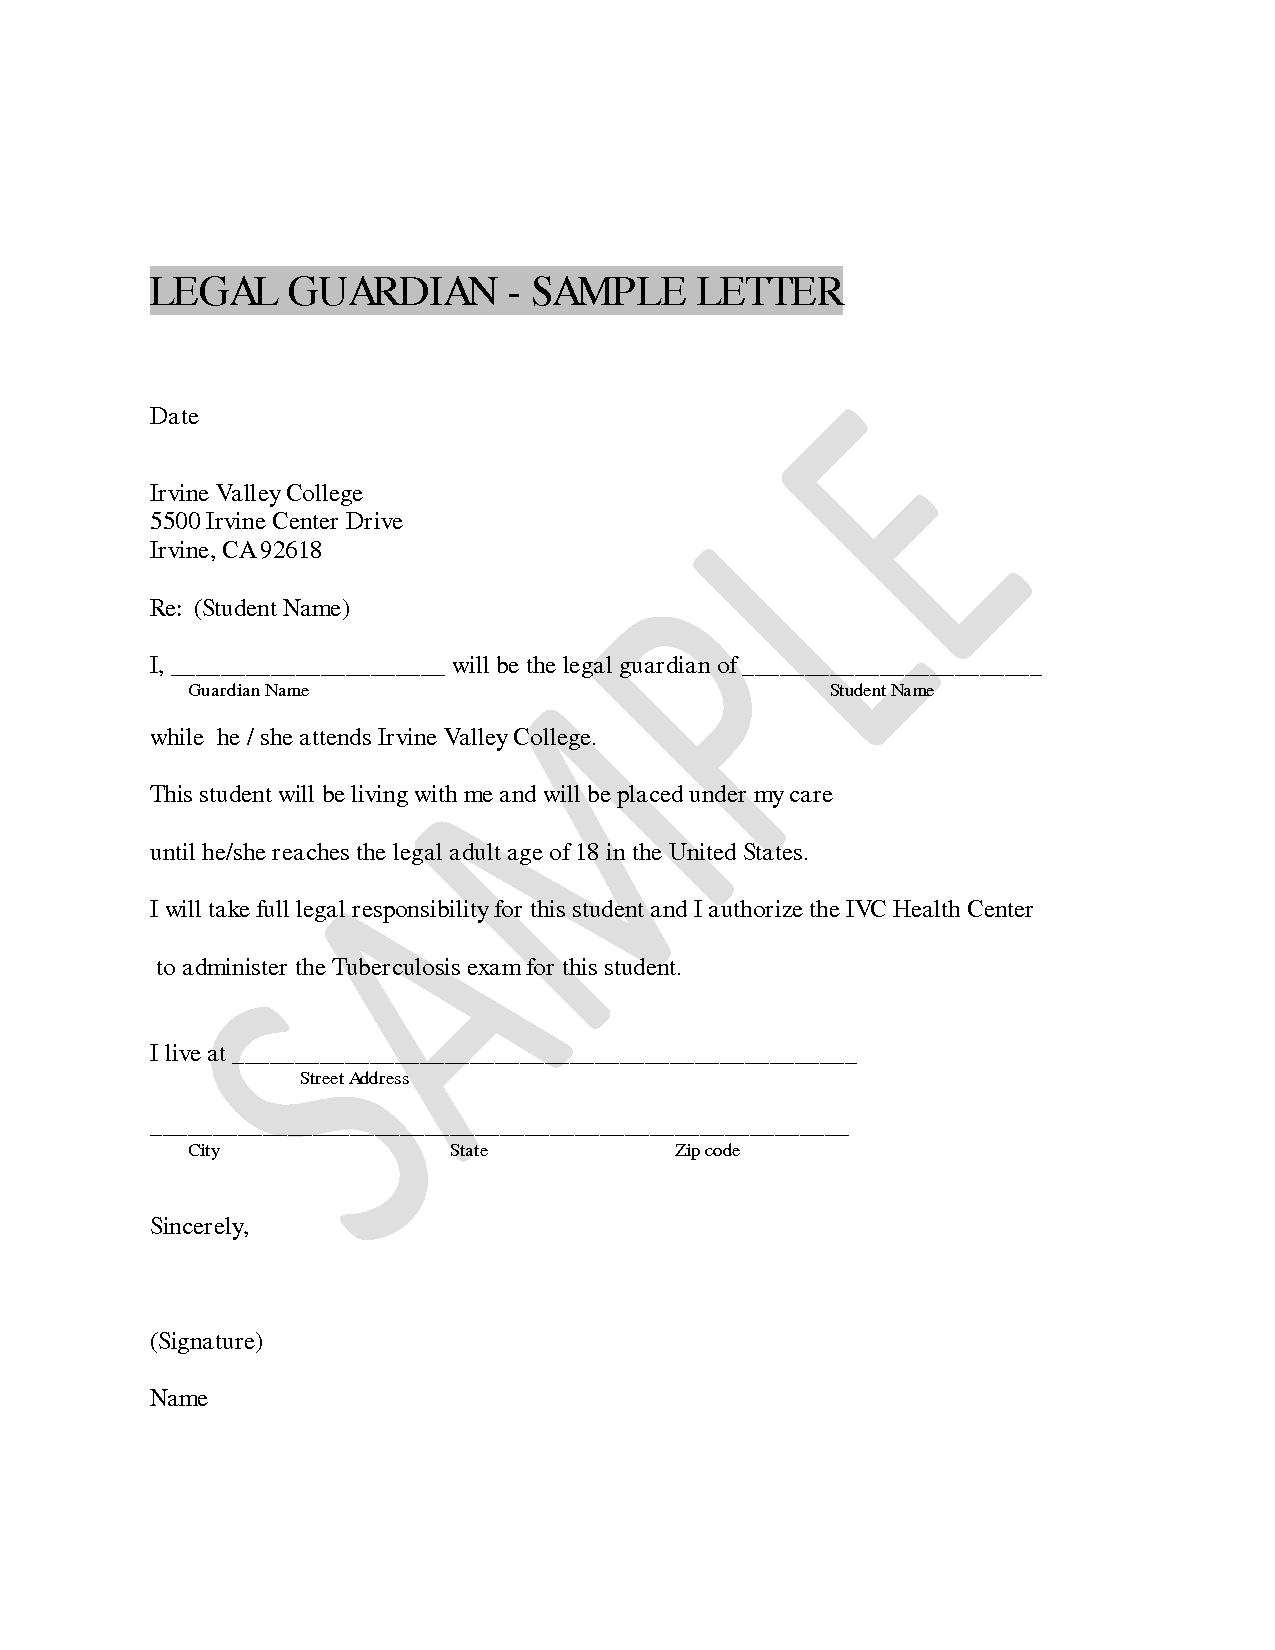 Authorization Letter Legal Guardian Guardianship Sample Affidavit